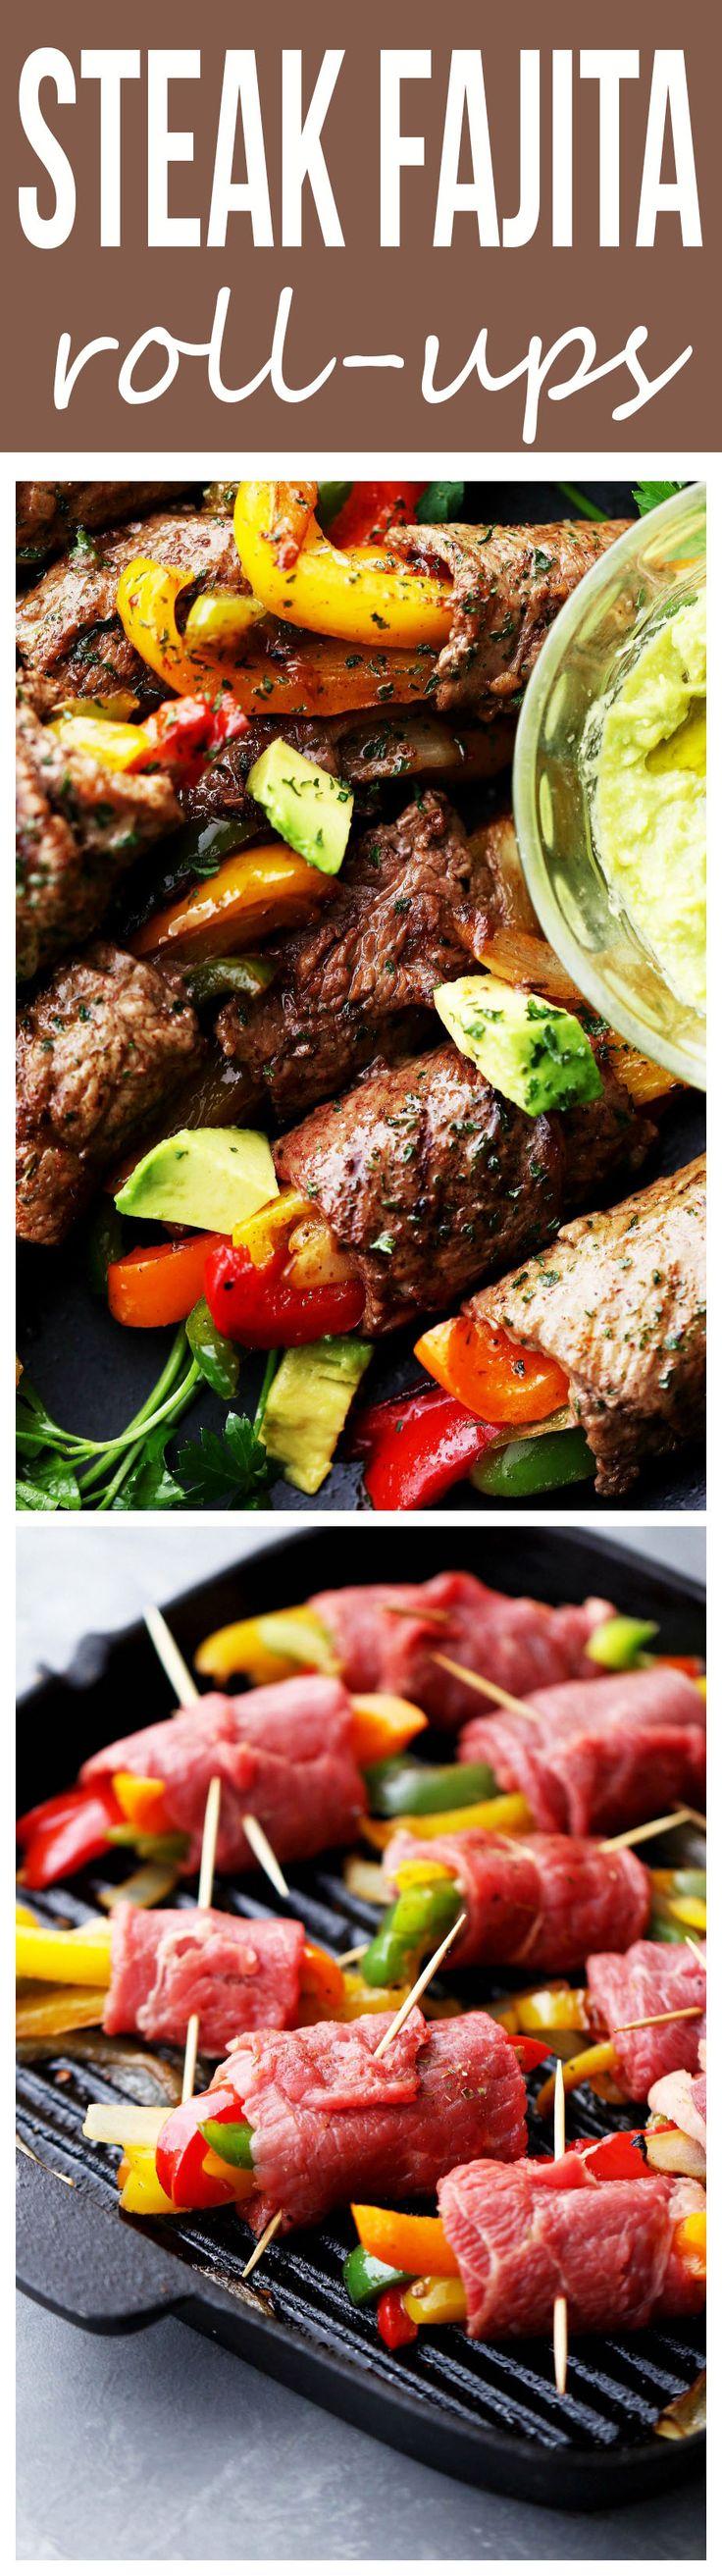 Steak Fajita Roll-Ups – Ditch the flour tortillas and make this amazing low-carb version of your favorite steak fajitas!